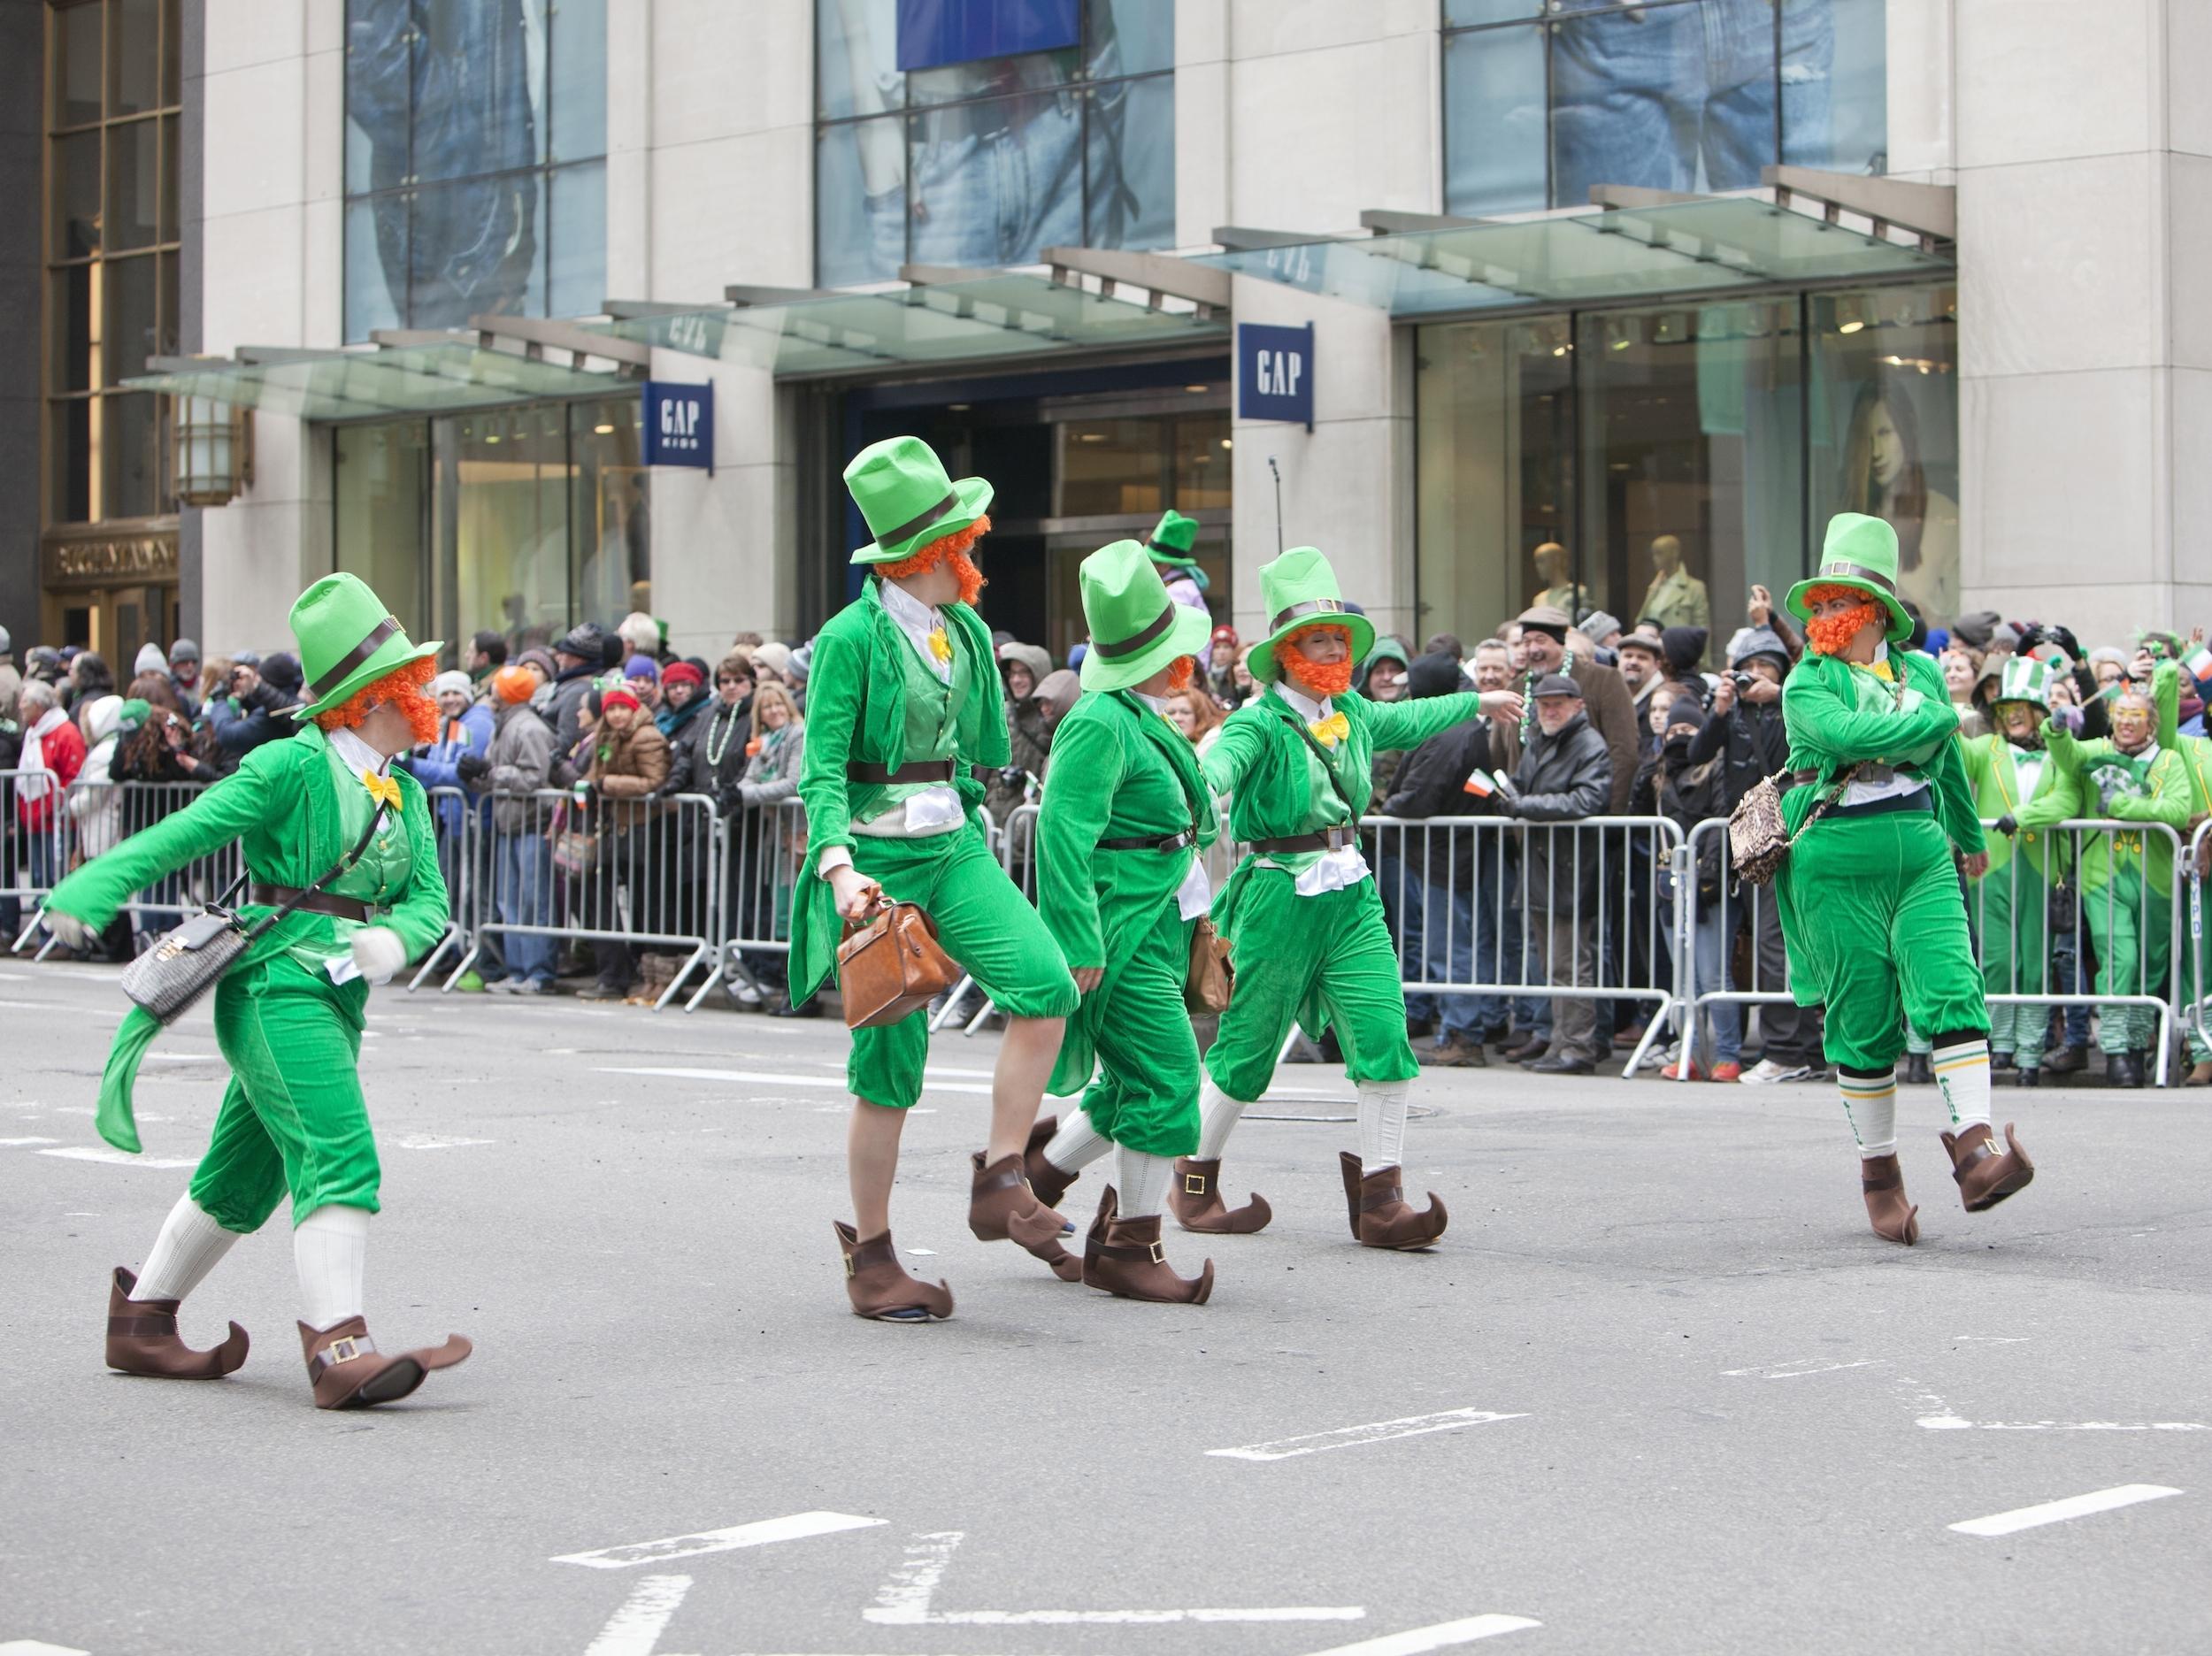 91b4fc870e30b99da2a7_St._Patrick_s_Day.jpg